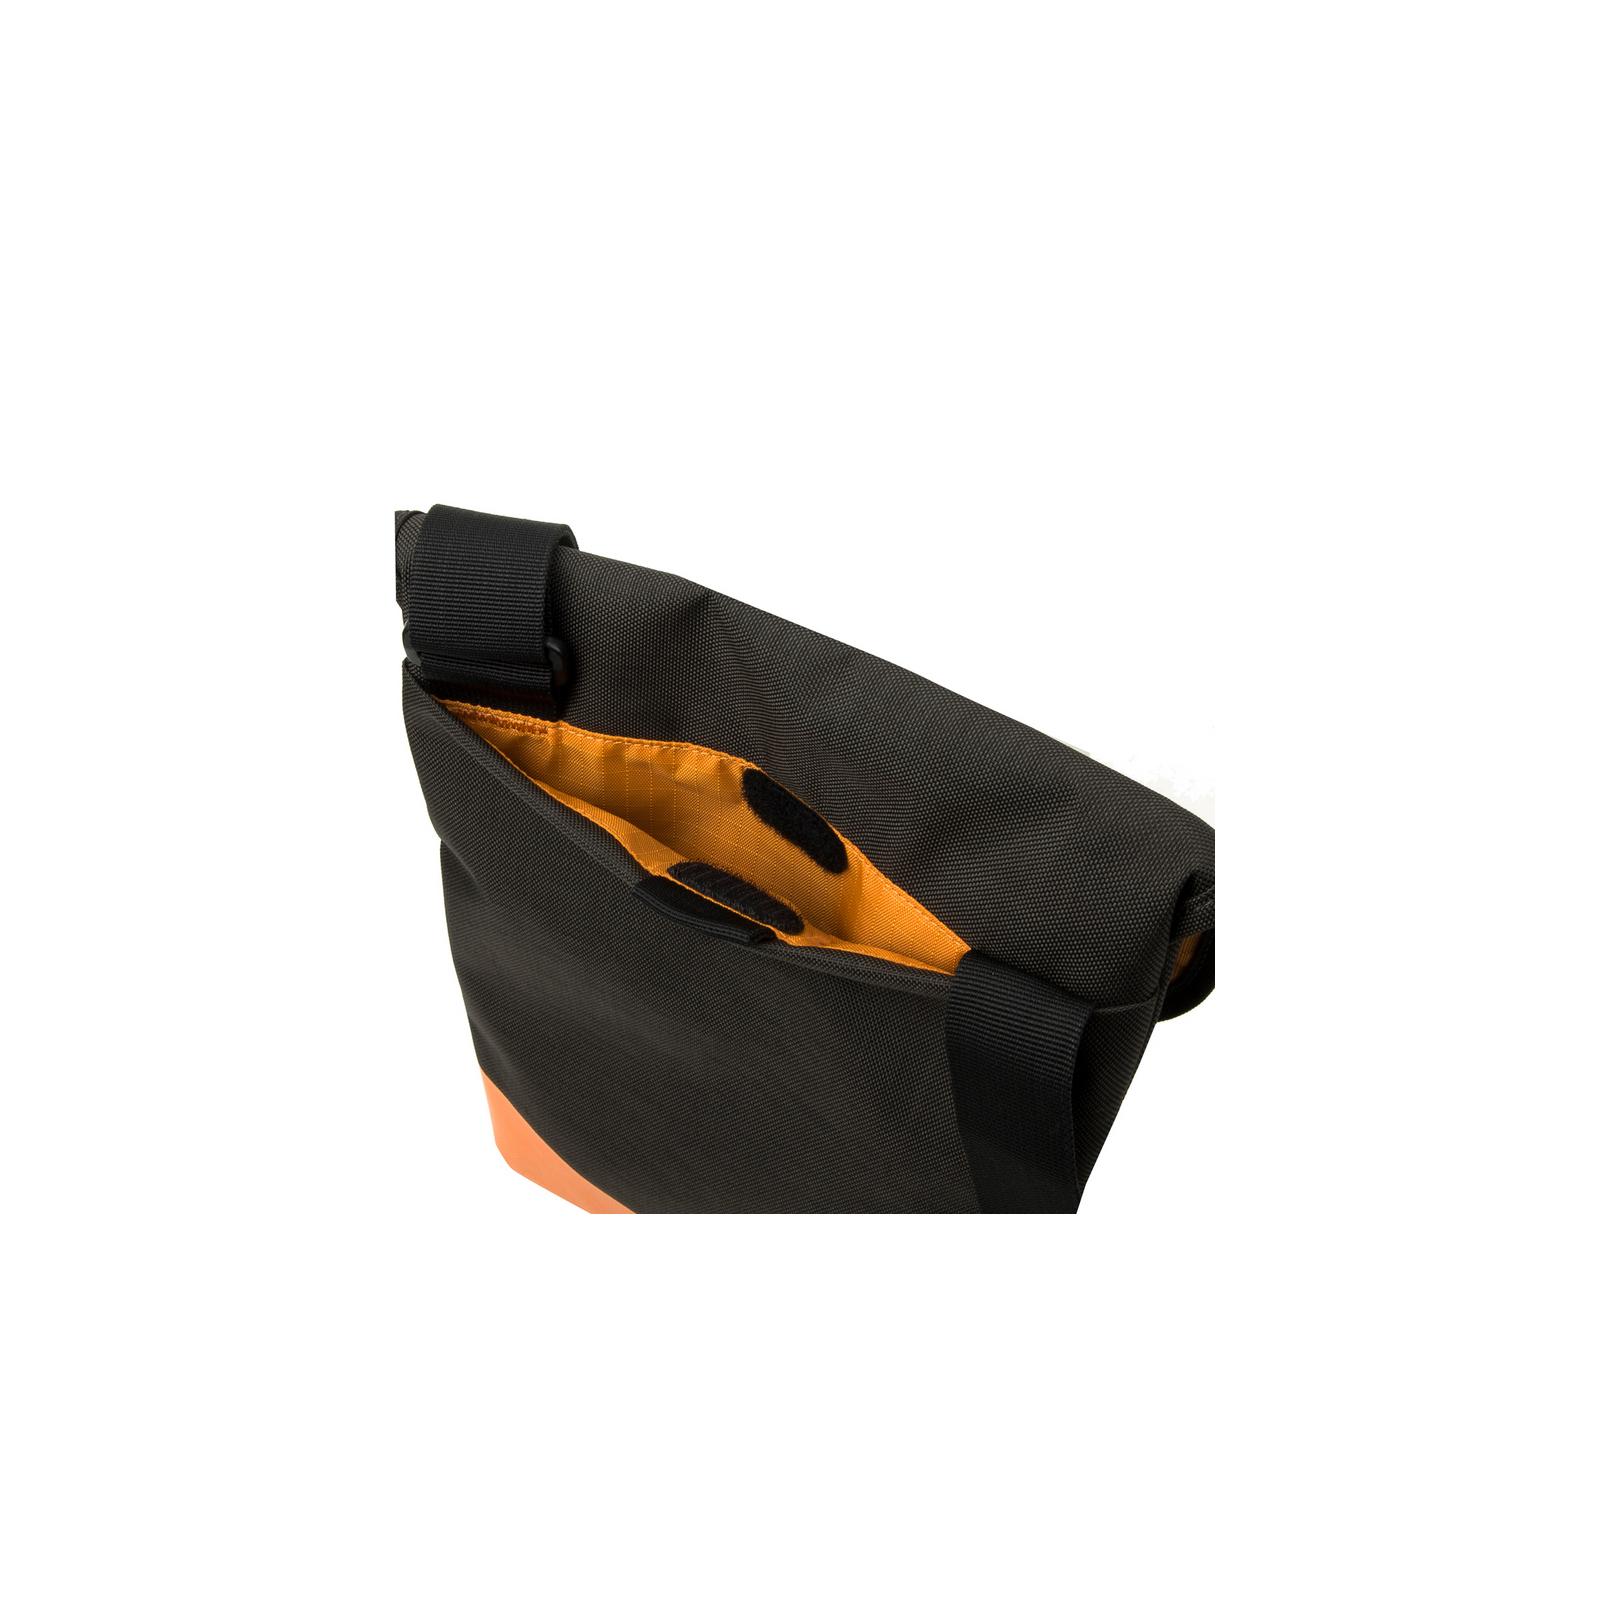 Чехол для планшета Crumpler 9 Private Surprise Sling S /charcoal - orange (PSS-S-004) изображение 5